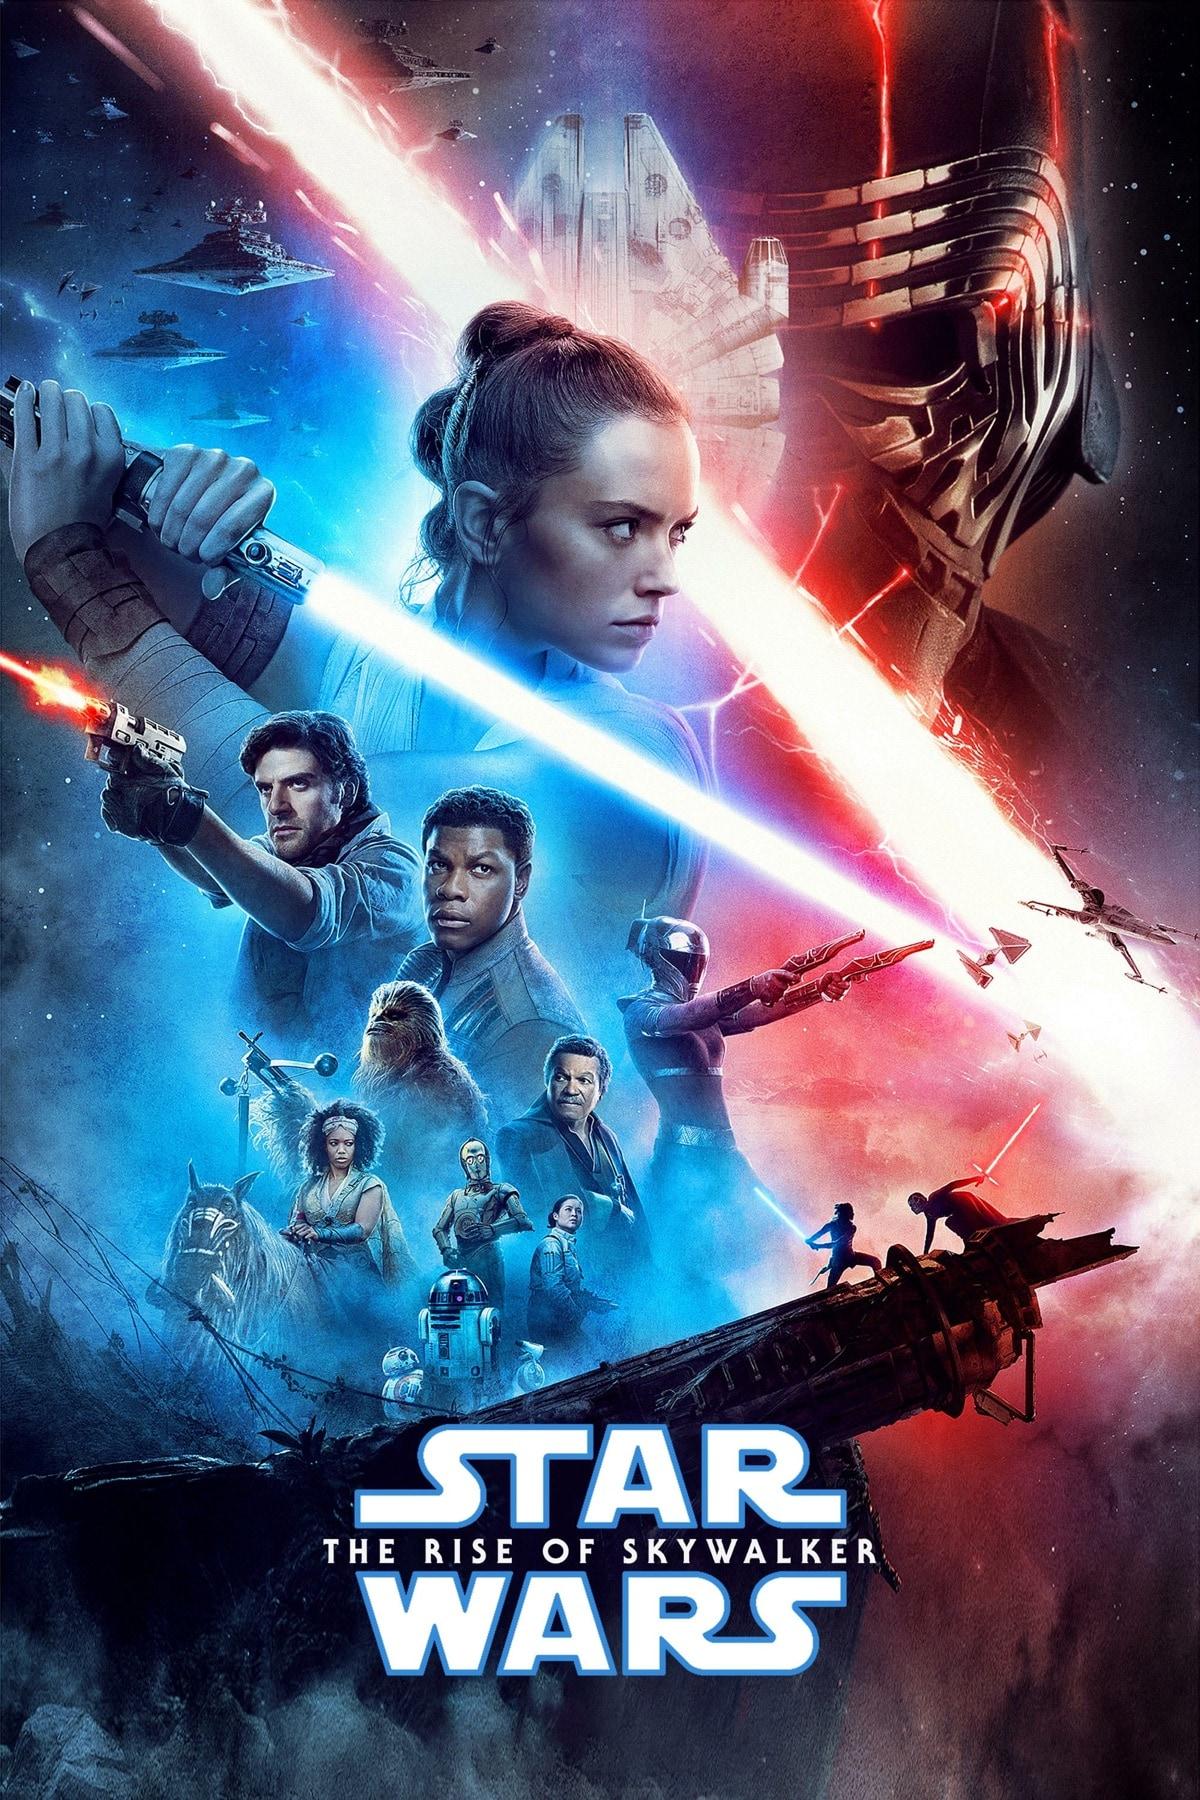 rise of skywalker poster 1 Star Wars The Rise of Skywalker